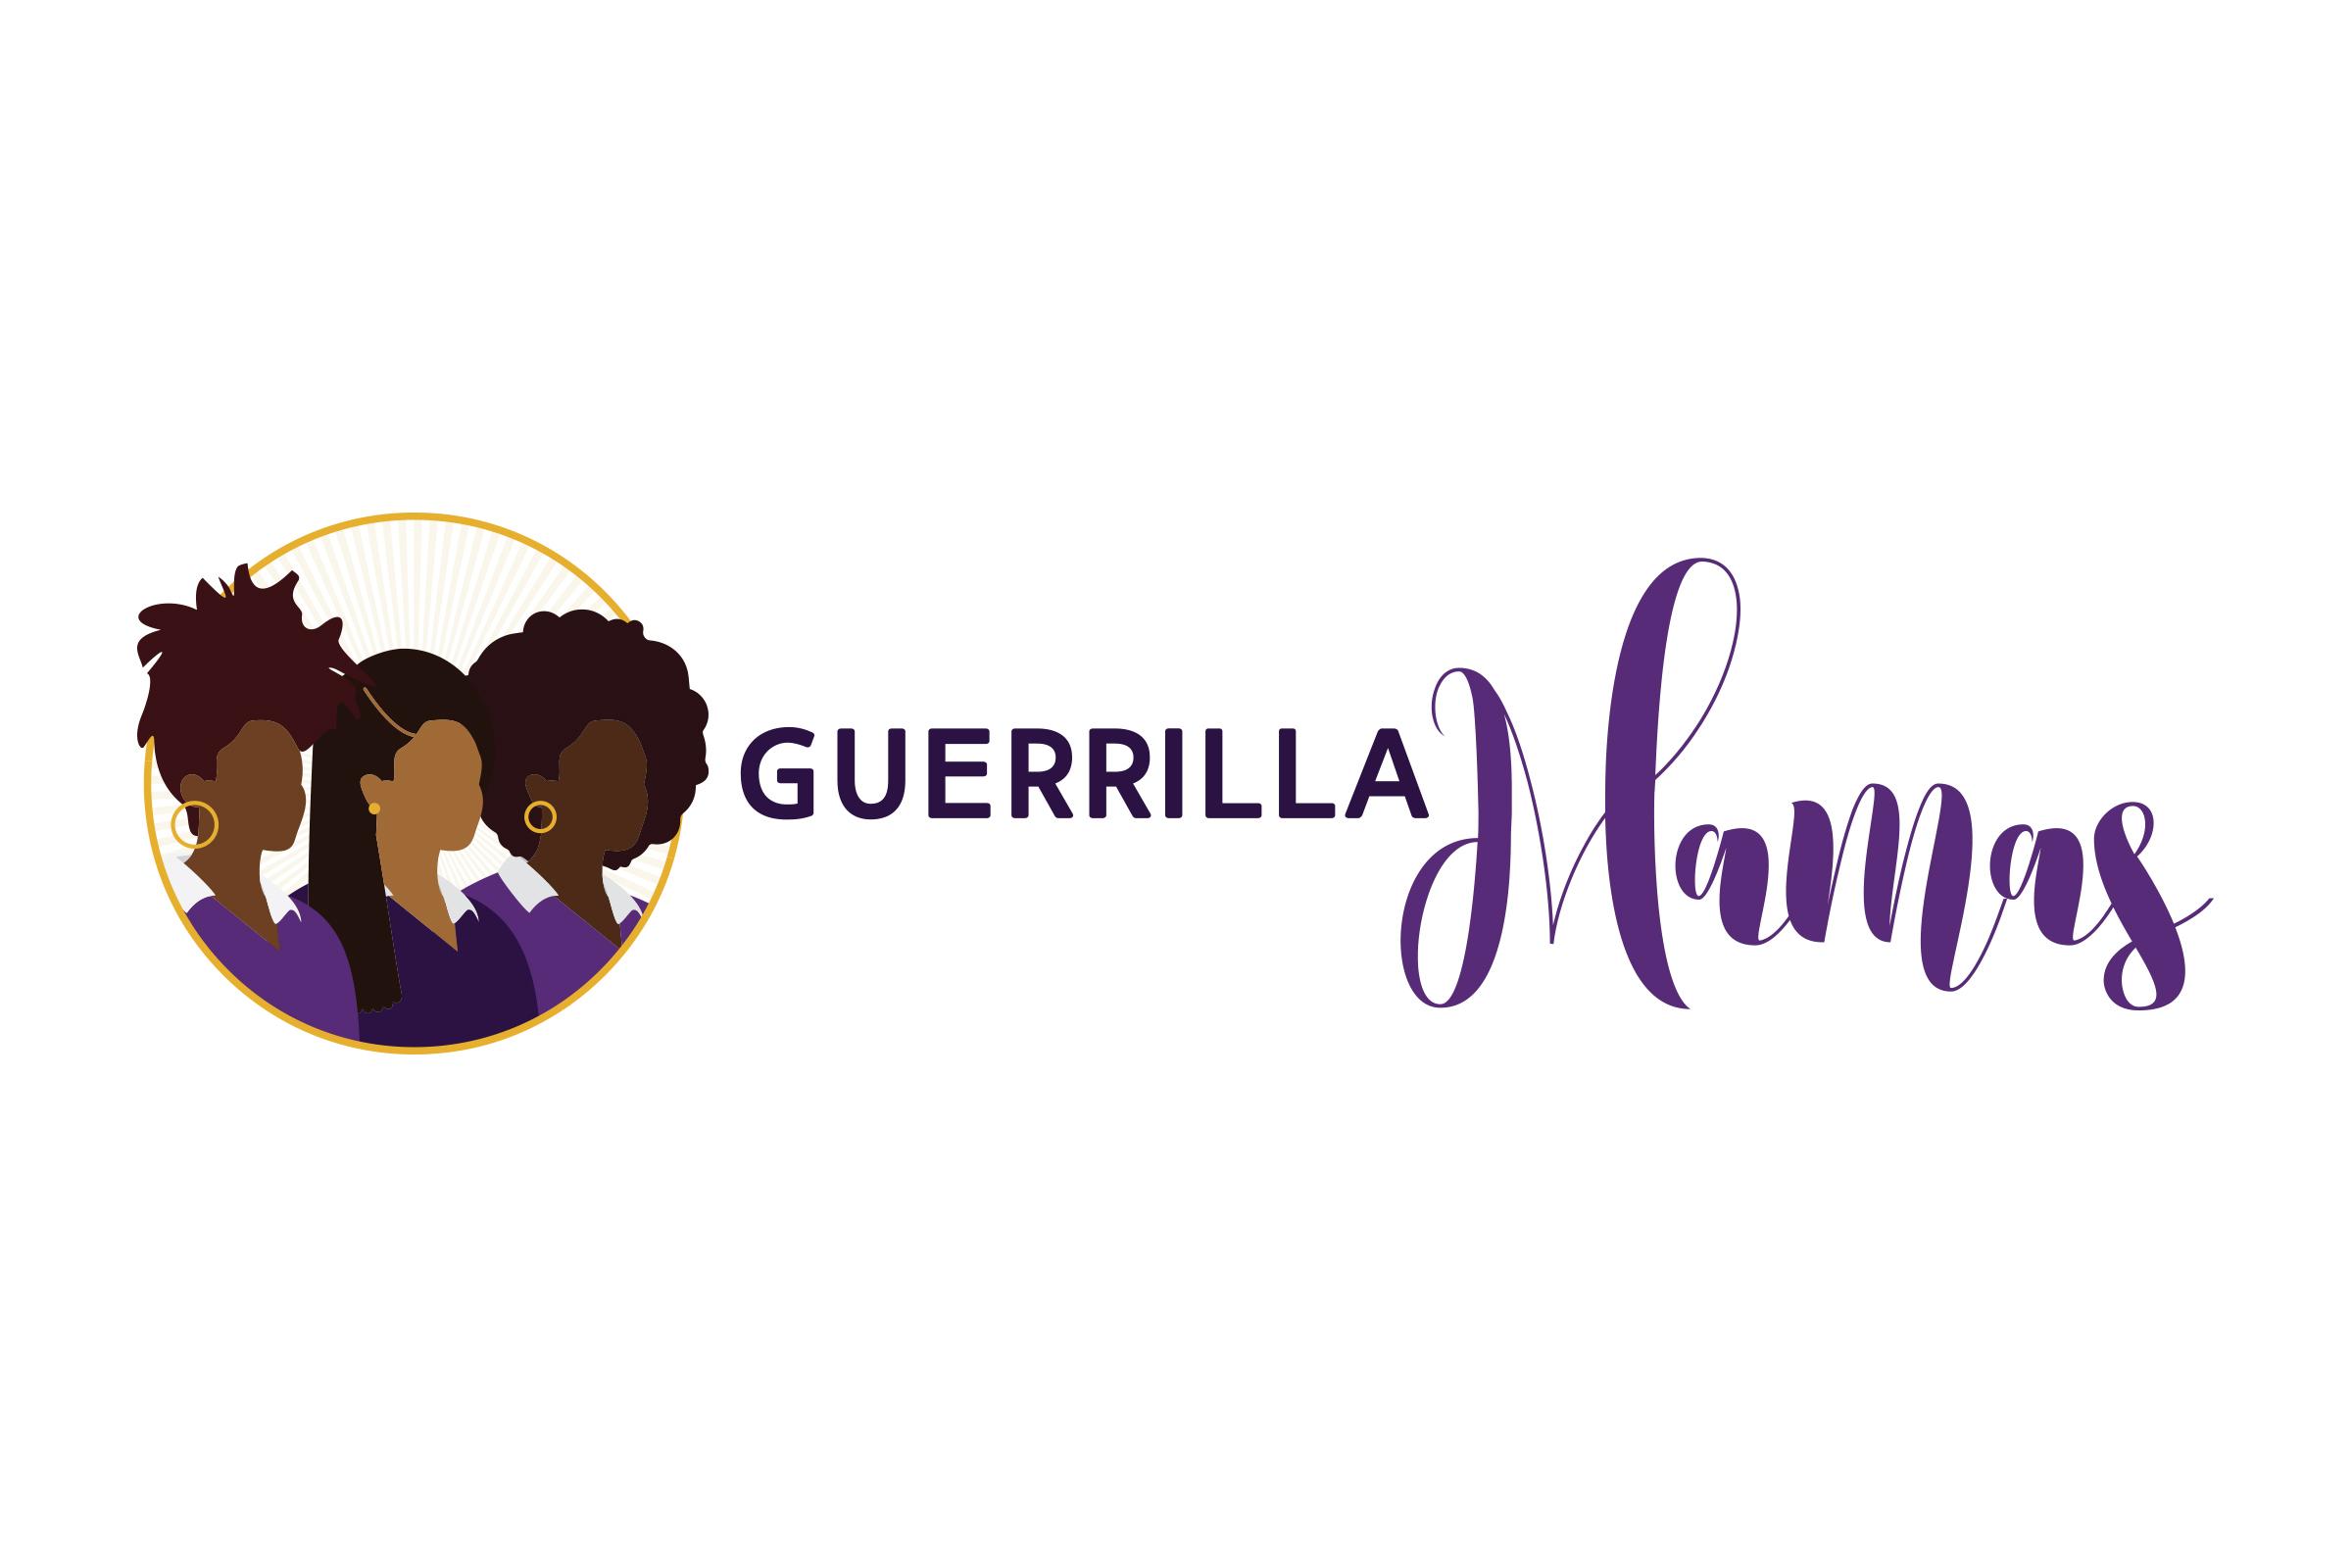 hearthfire-creative-logo-brand-identity-designer-denver-colorado-guerrilla-mamas-4.jpg